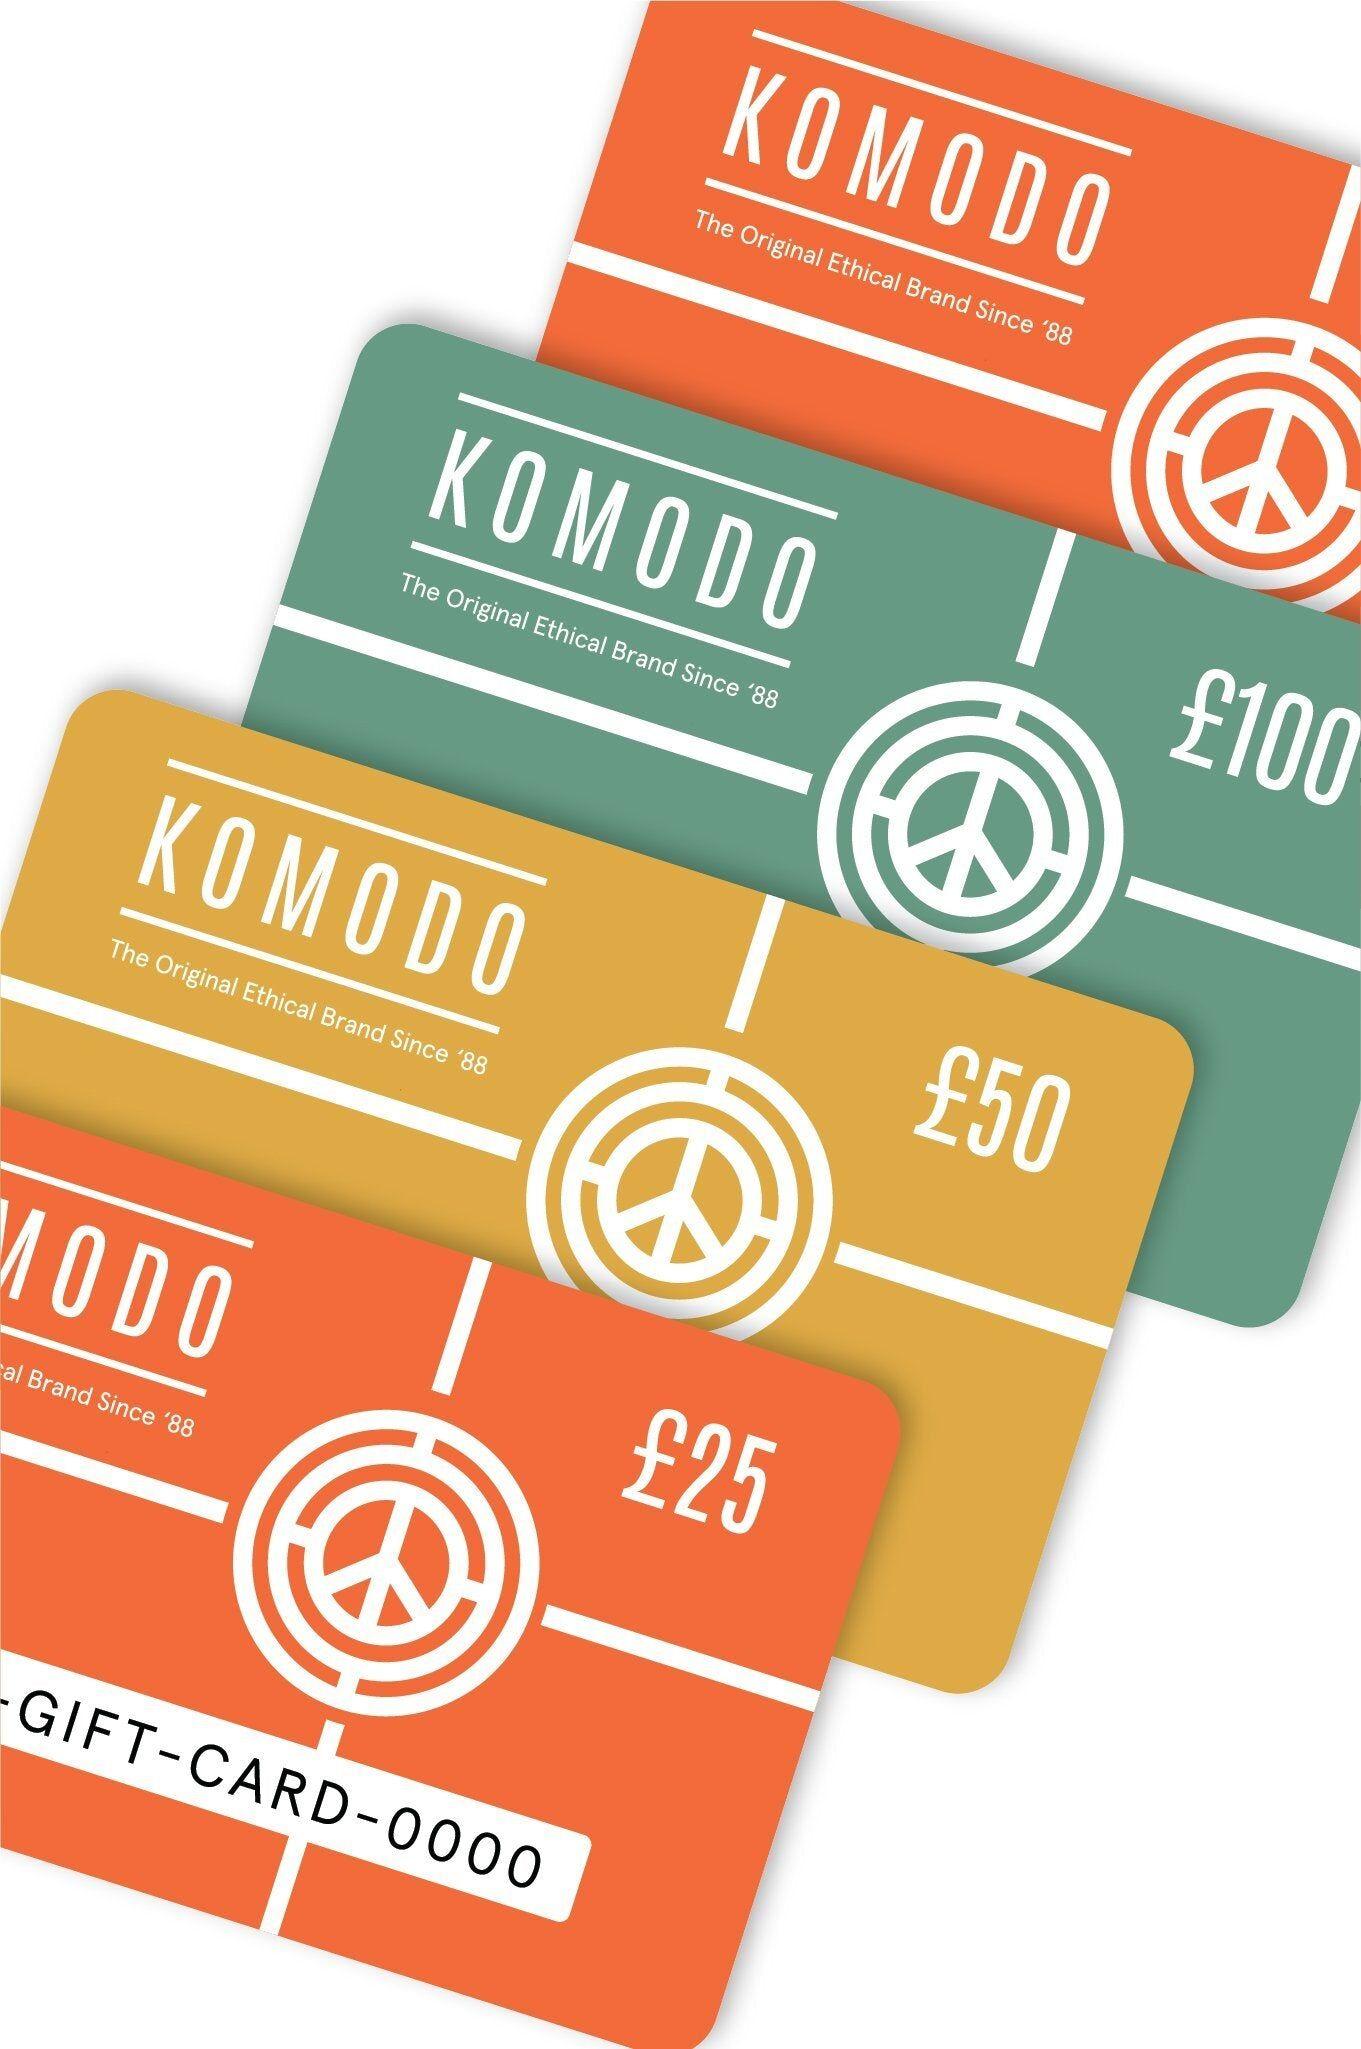 Komodo Gift Cards, £25.00